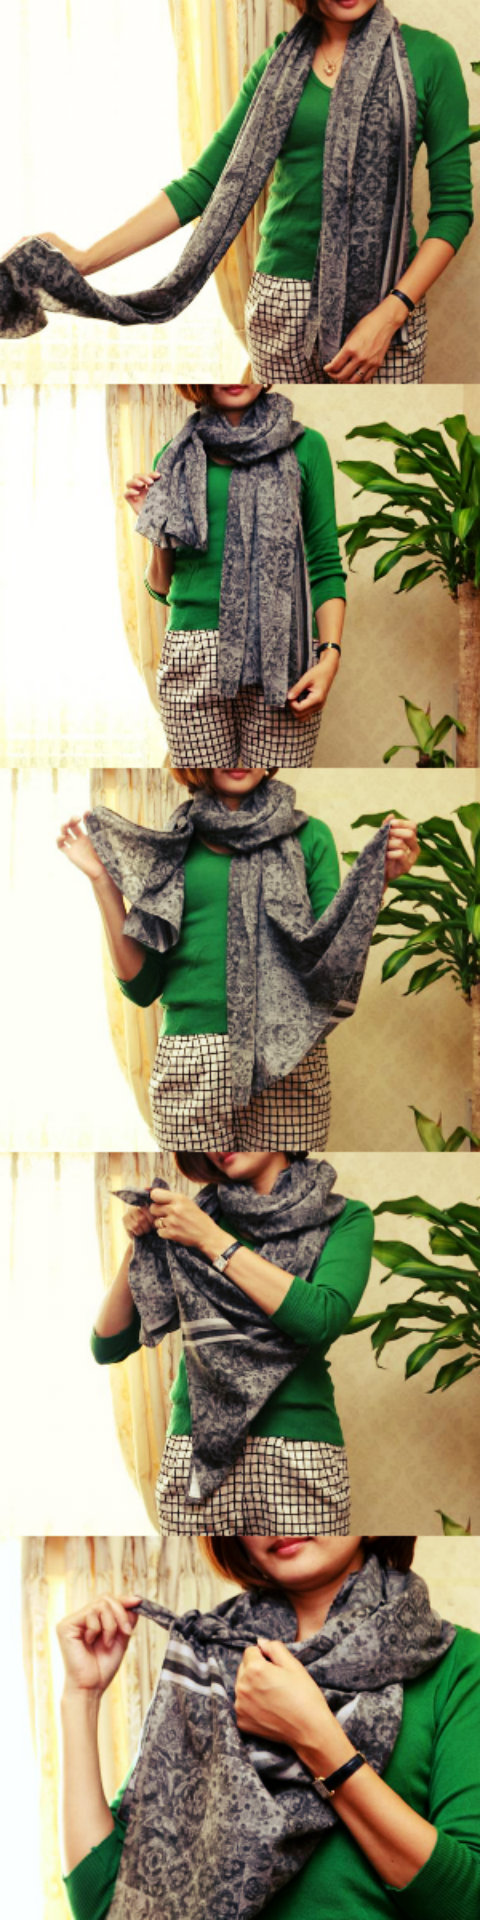 makico_scarf_02_02